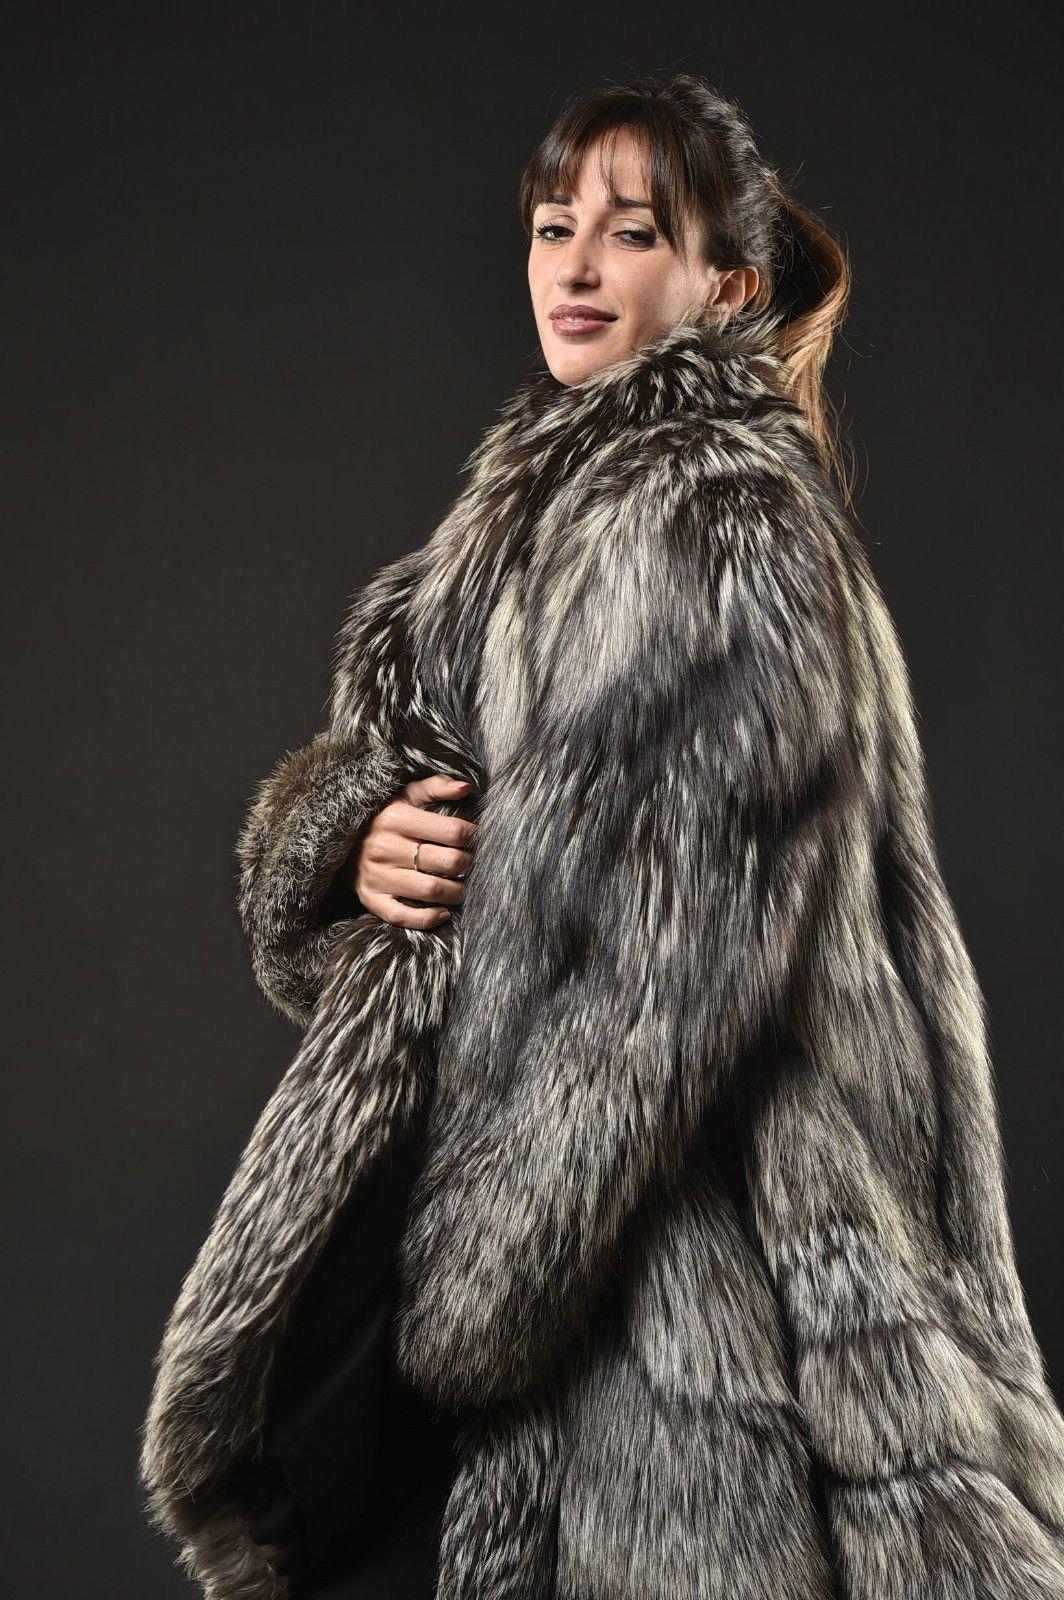 silver fox fur coat manteau pelisse fourrure renard argent pelliccia volpe ebay fur 16. Black Bedroom Furniture Sets. Home Design Ideas